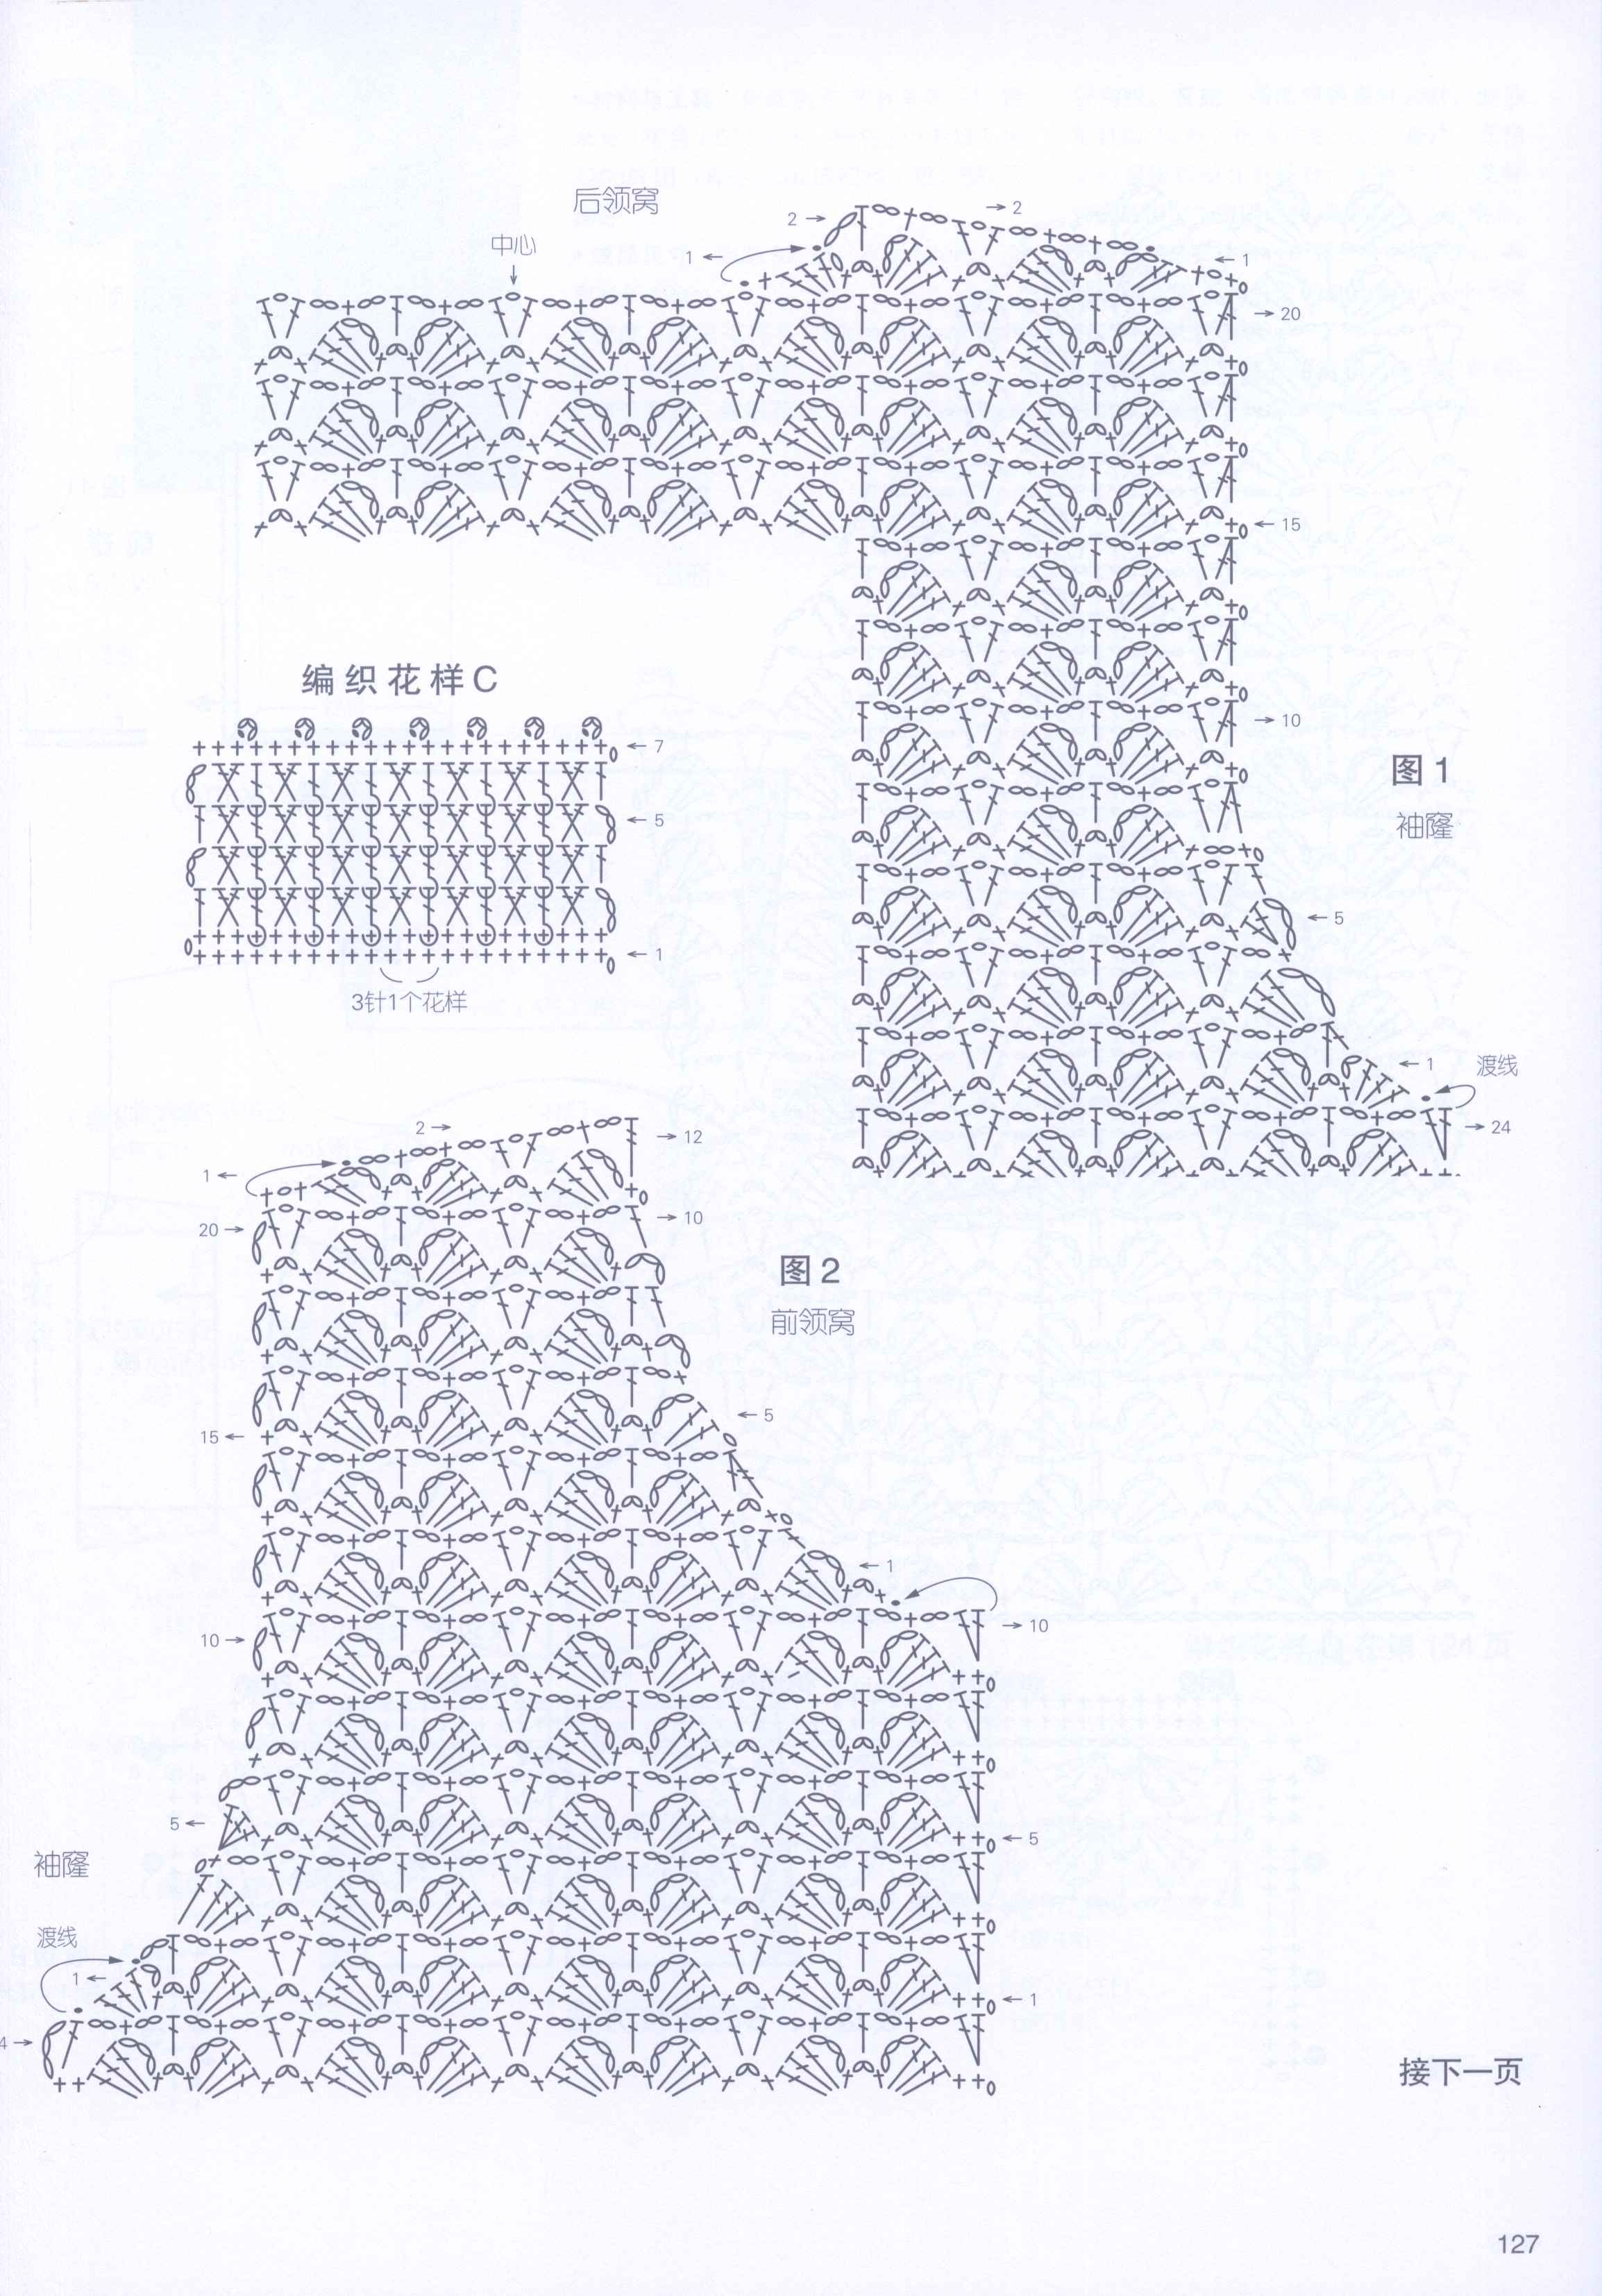 53rxngk5